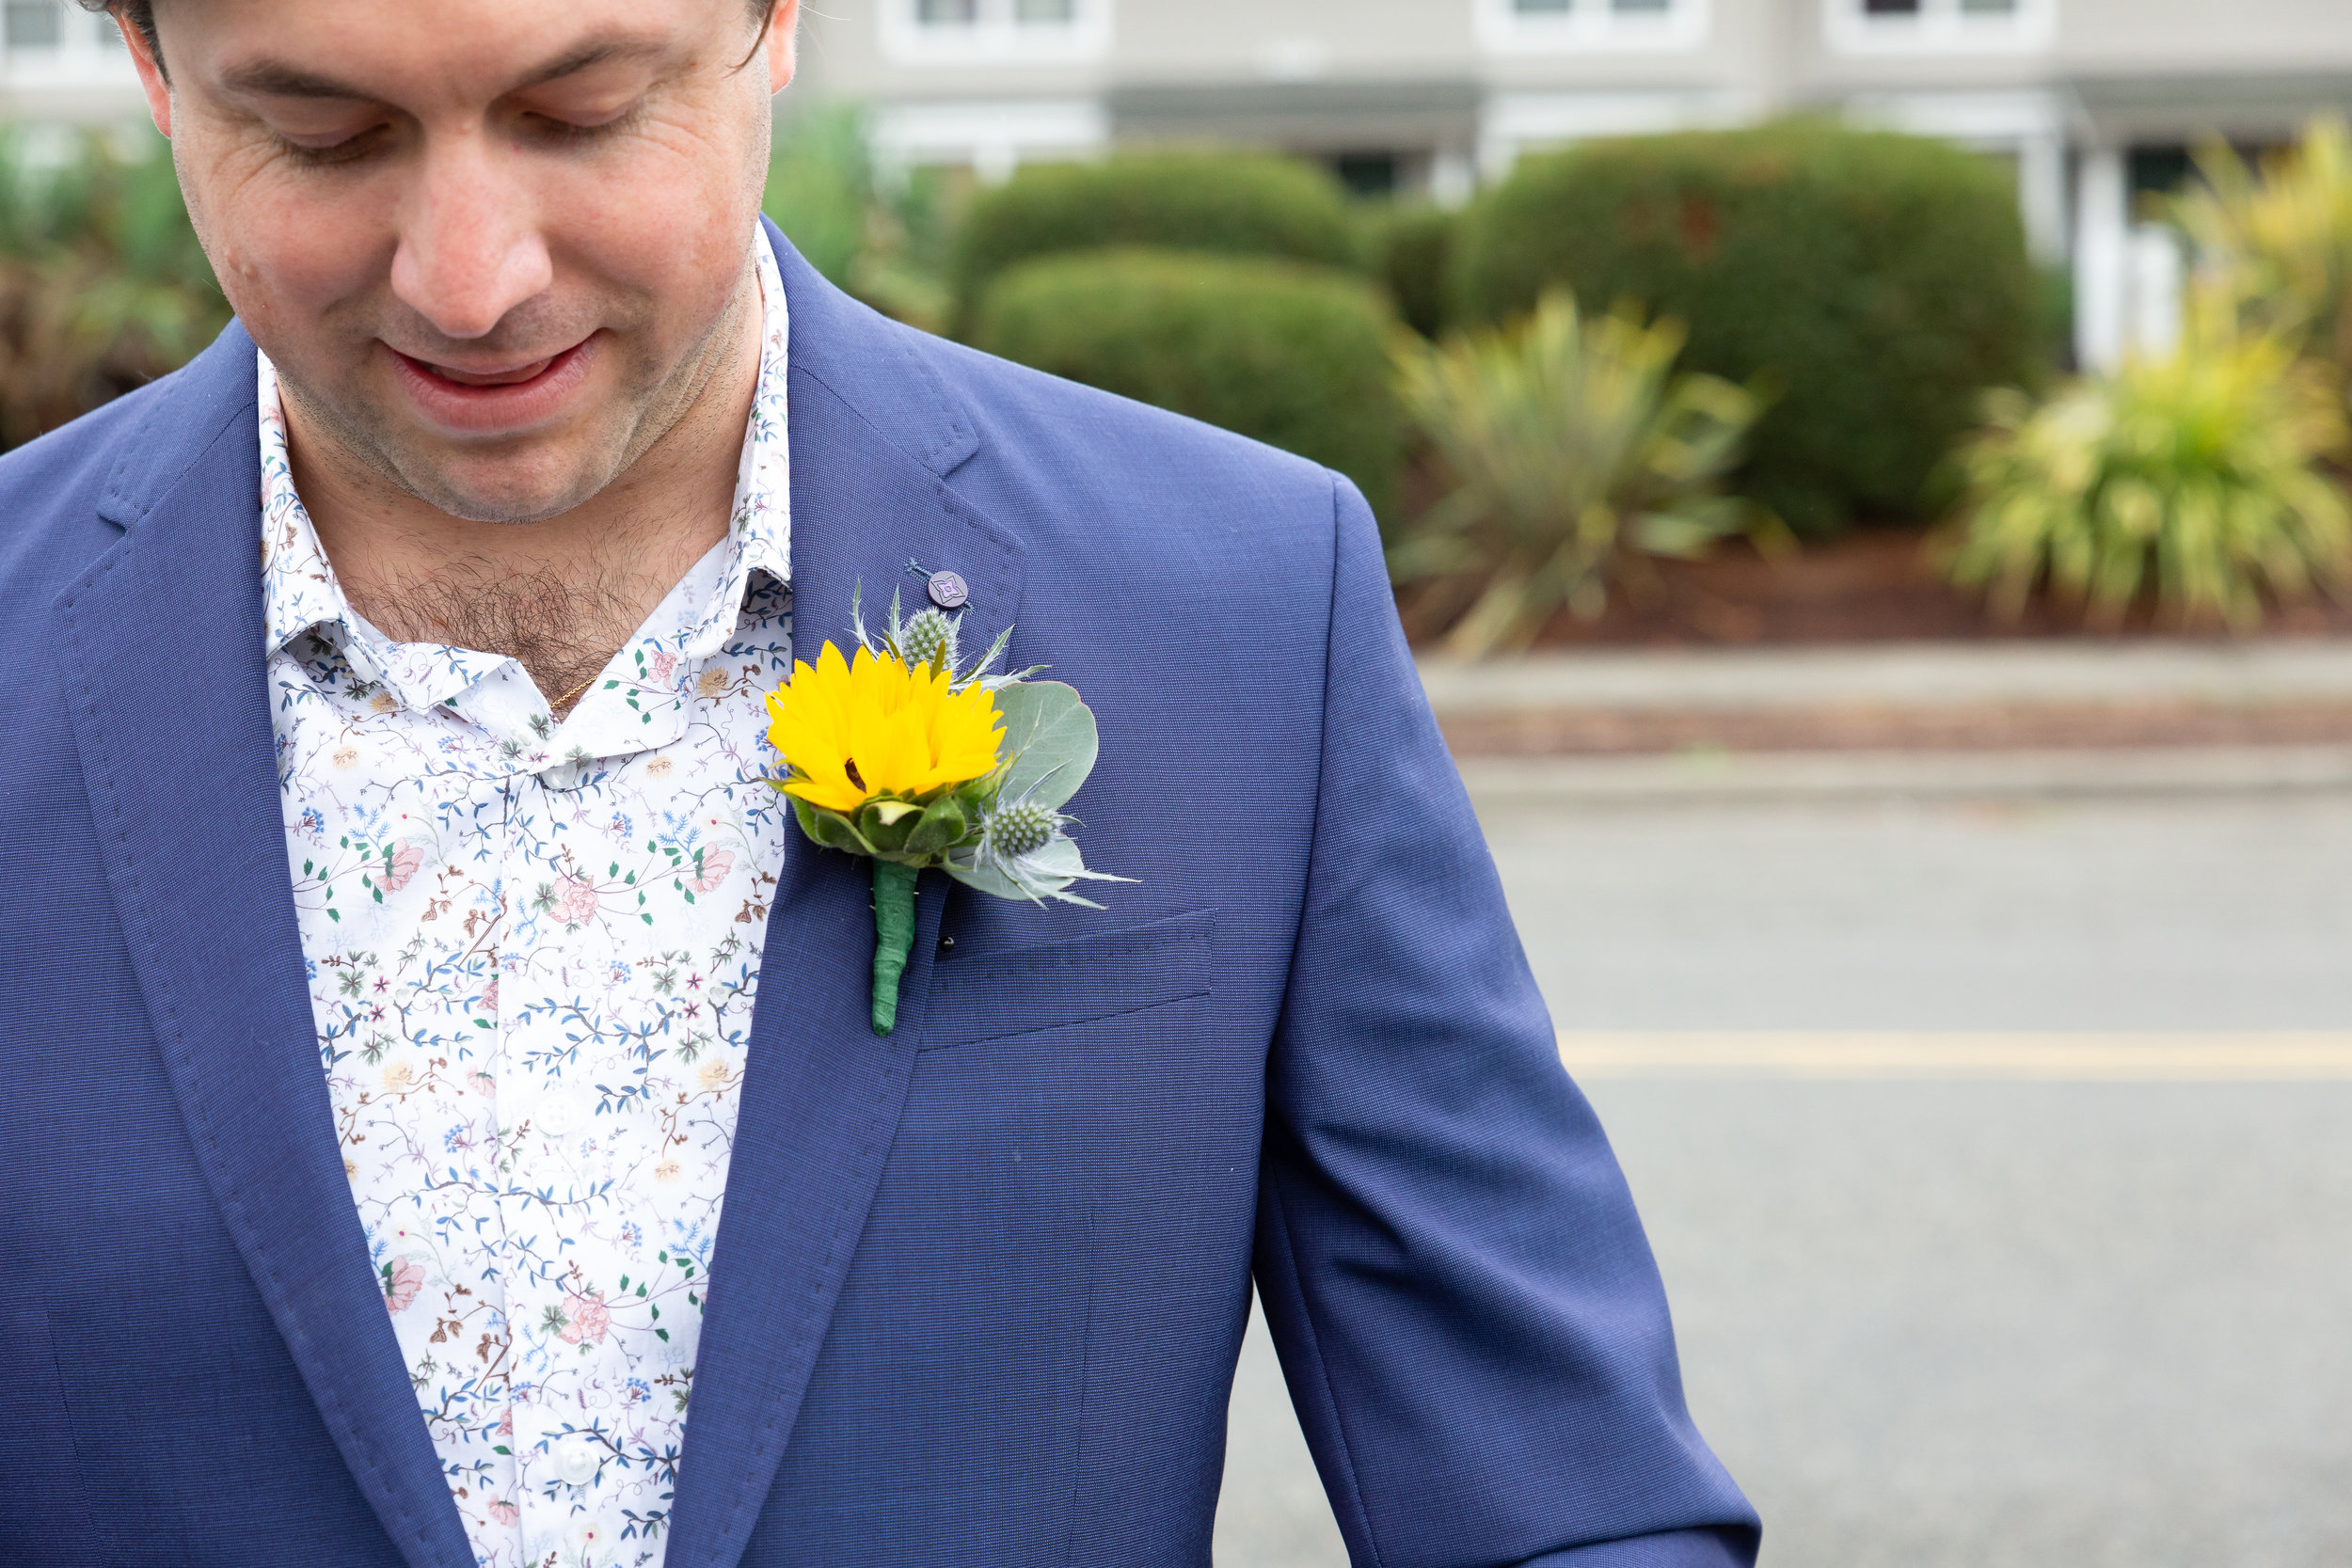 Gorski Wedding first look set-2.jpg